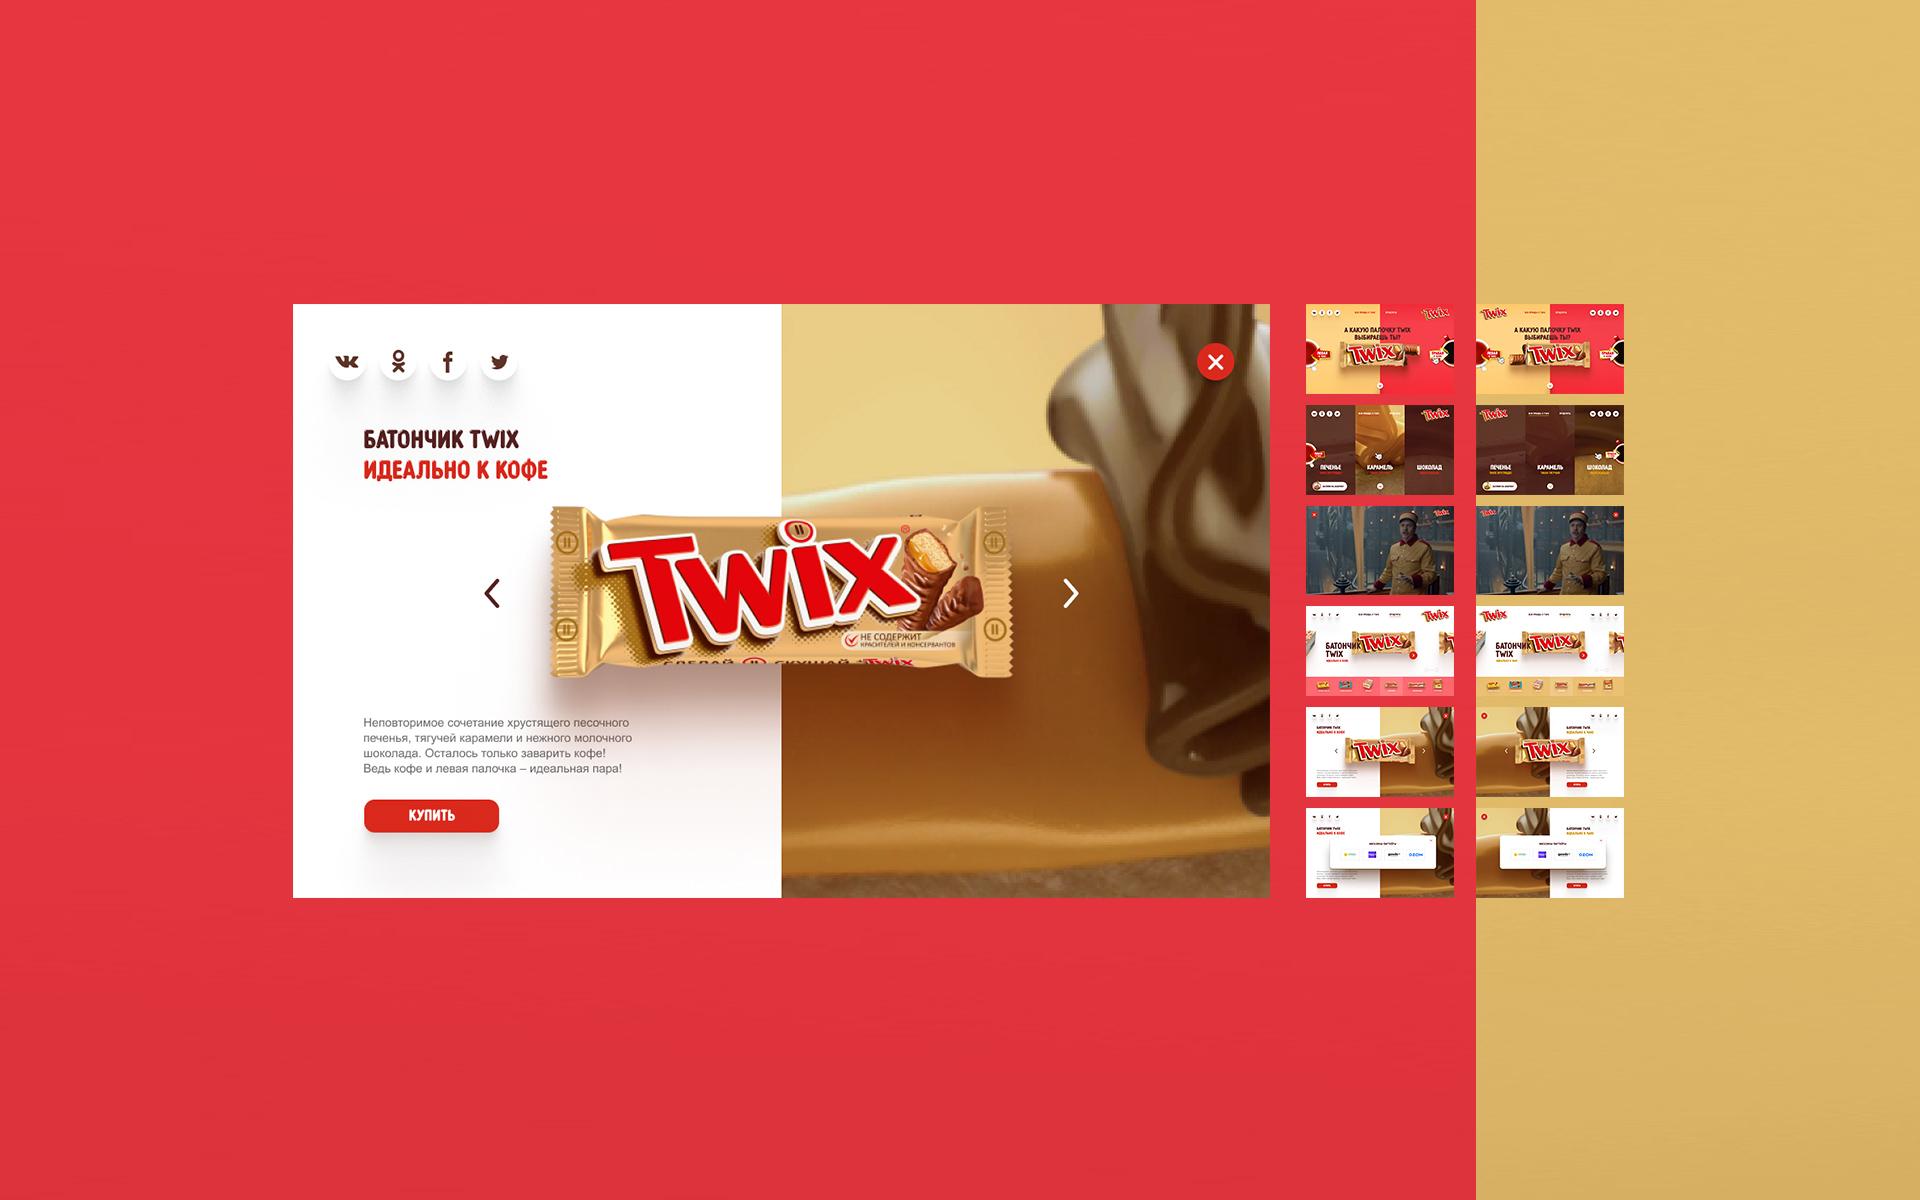 Twix website